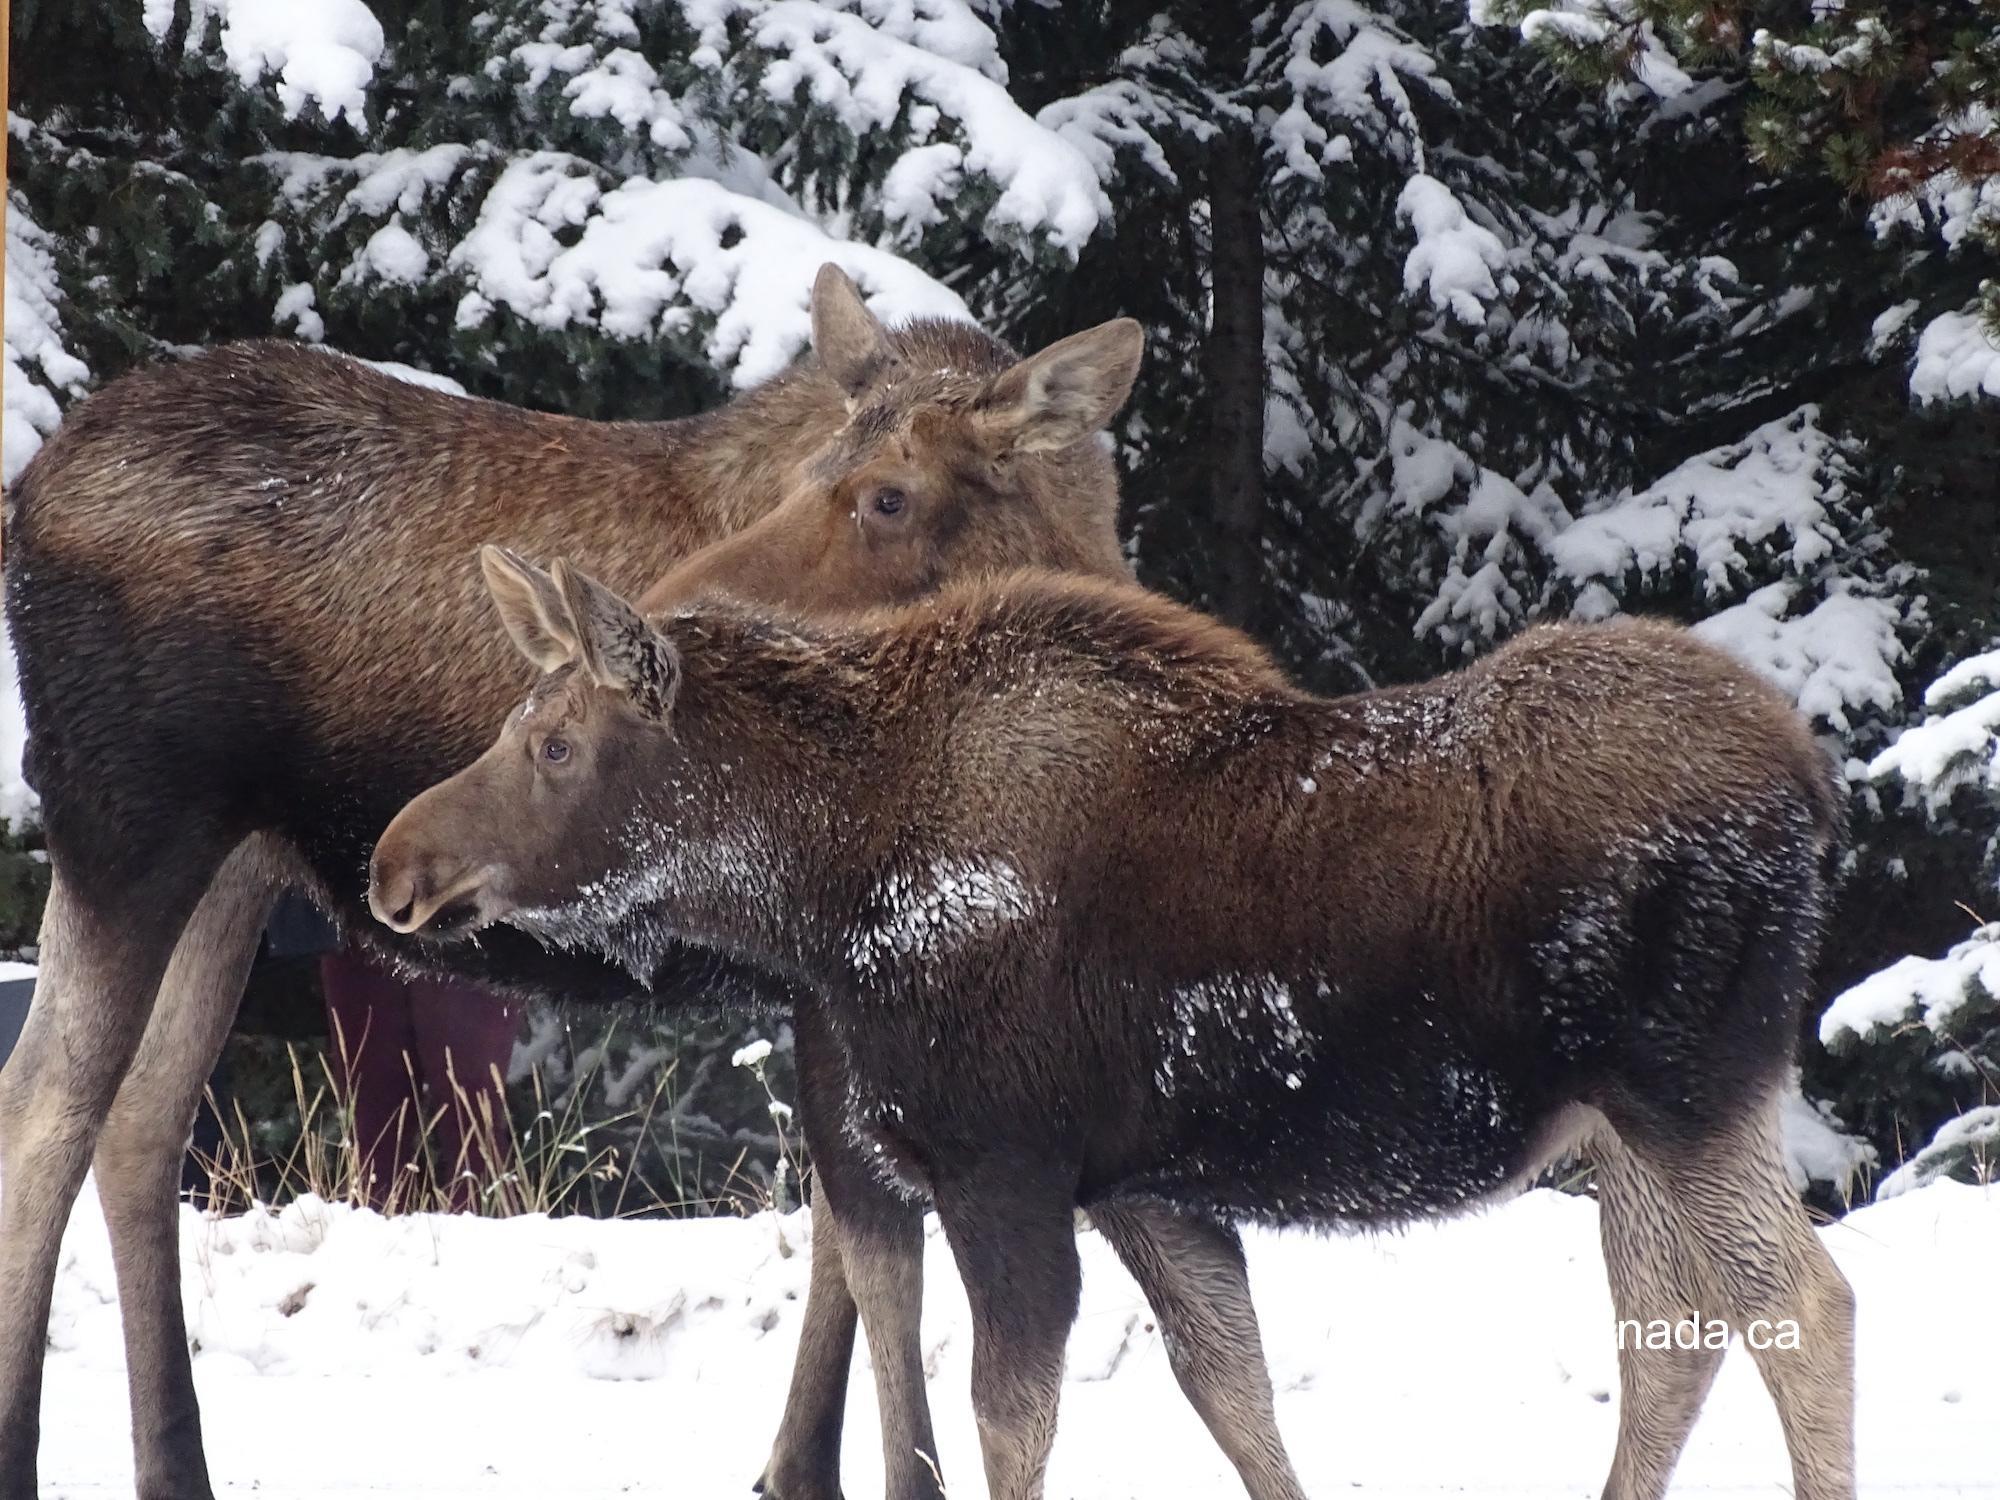 Moose with calf at Maligne Lake near Jasper AB #olafincanada #alberta #rockies #jasper #wildlife #moose